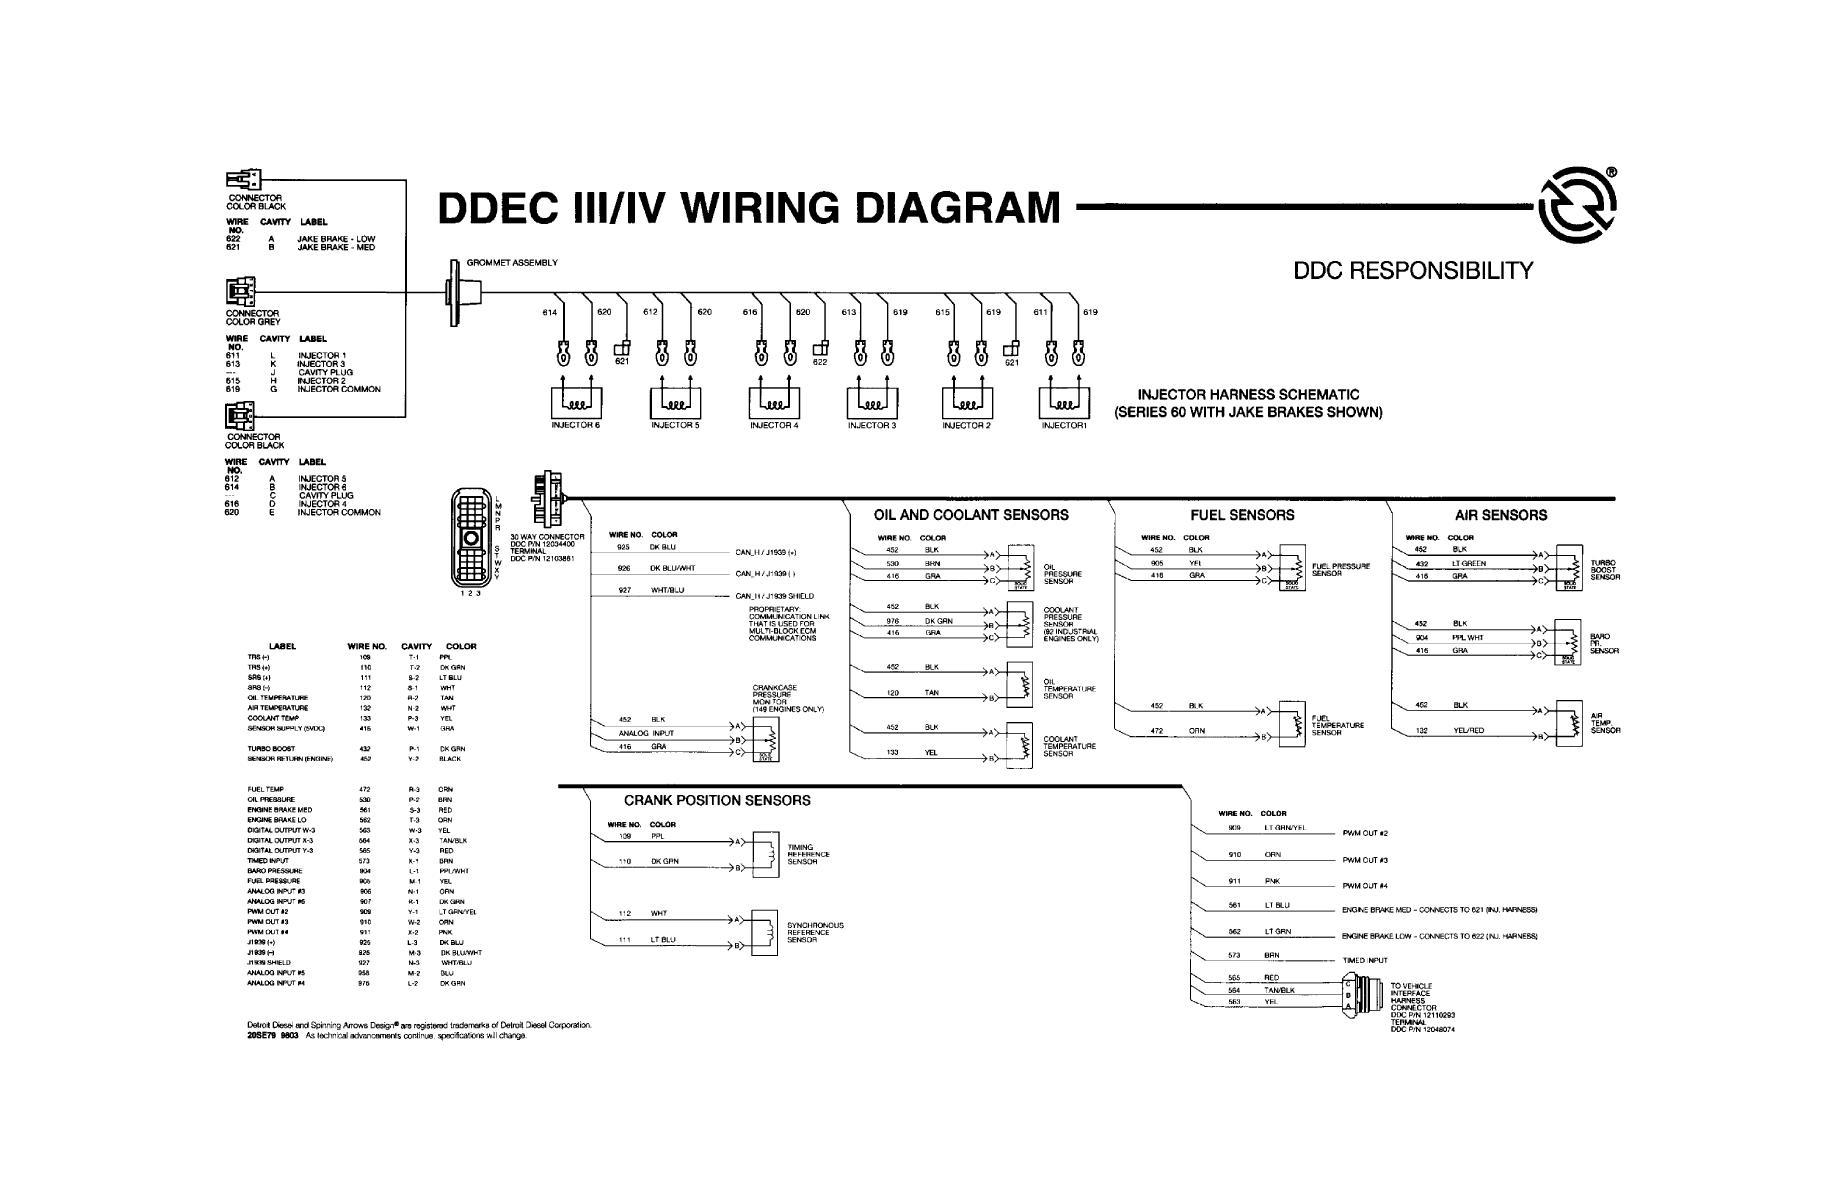 Tremendous Wiring Diagram Moreover Detroit Ecm Engine Brake On Ddec 3 Ecm Wiring Digital Resources Indicompassionincorg